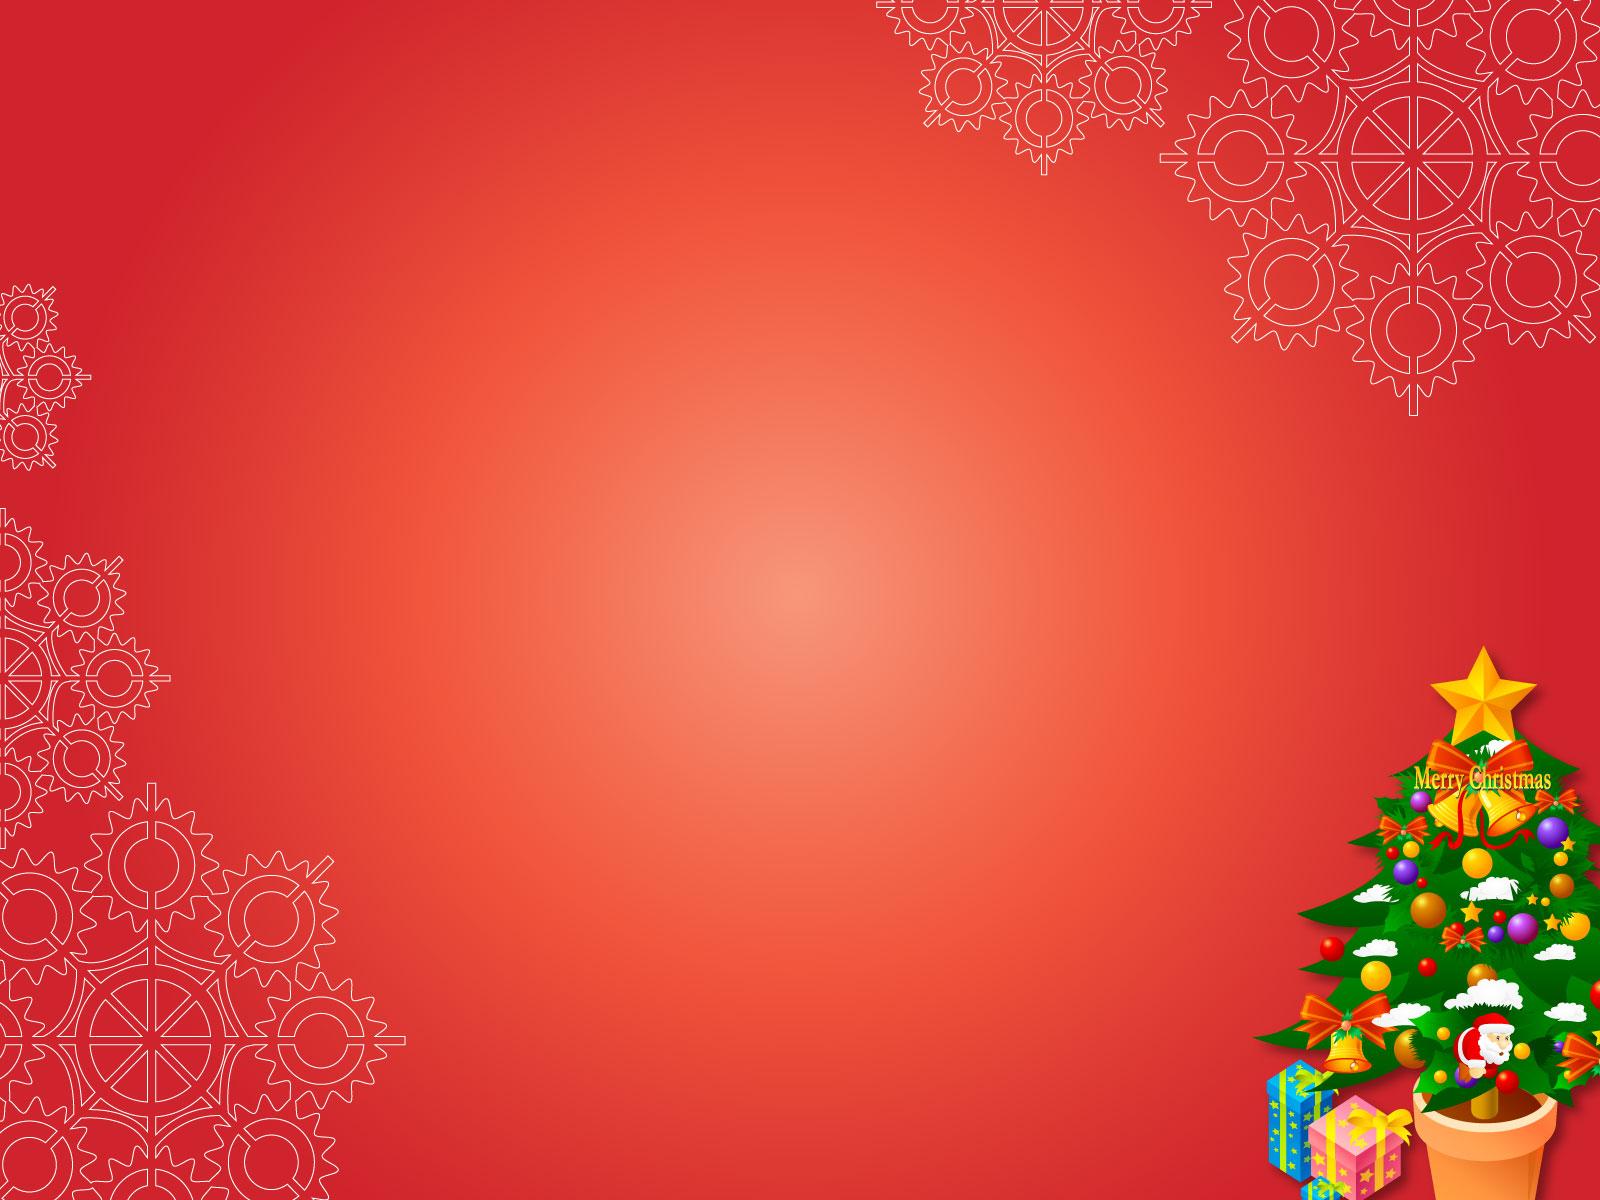 backgrounds christmas - wallpapersafari